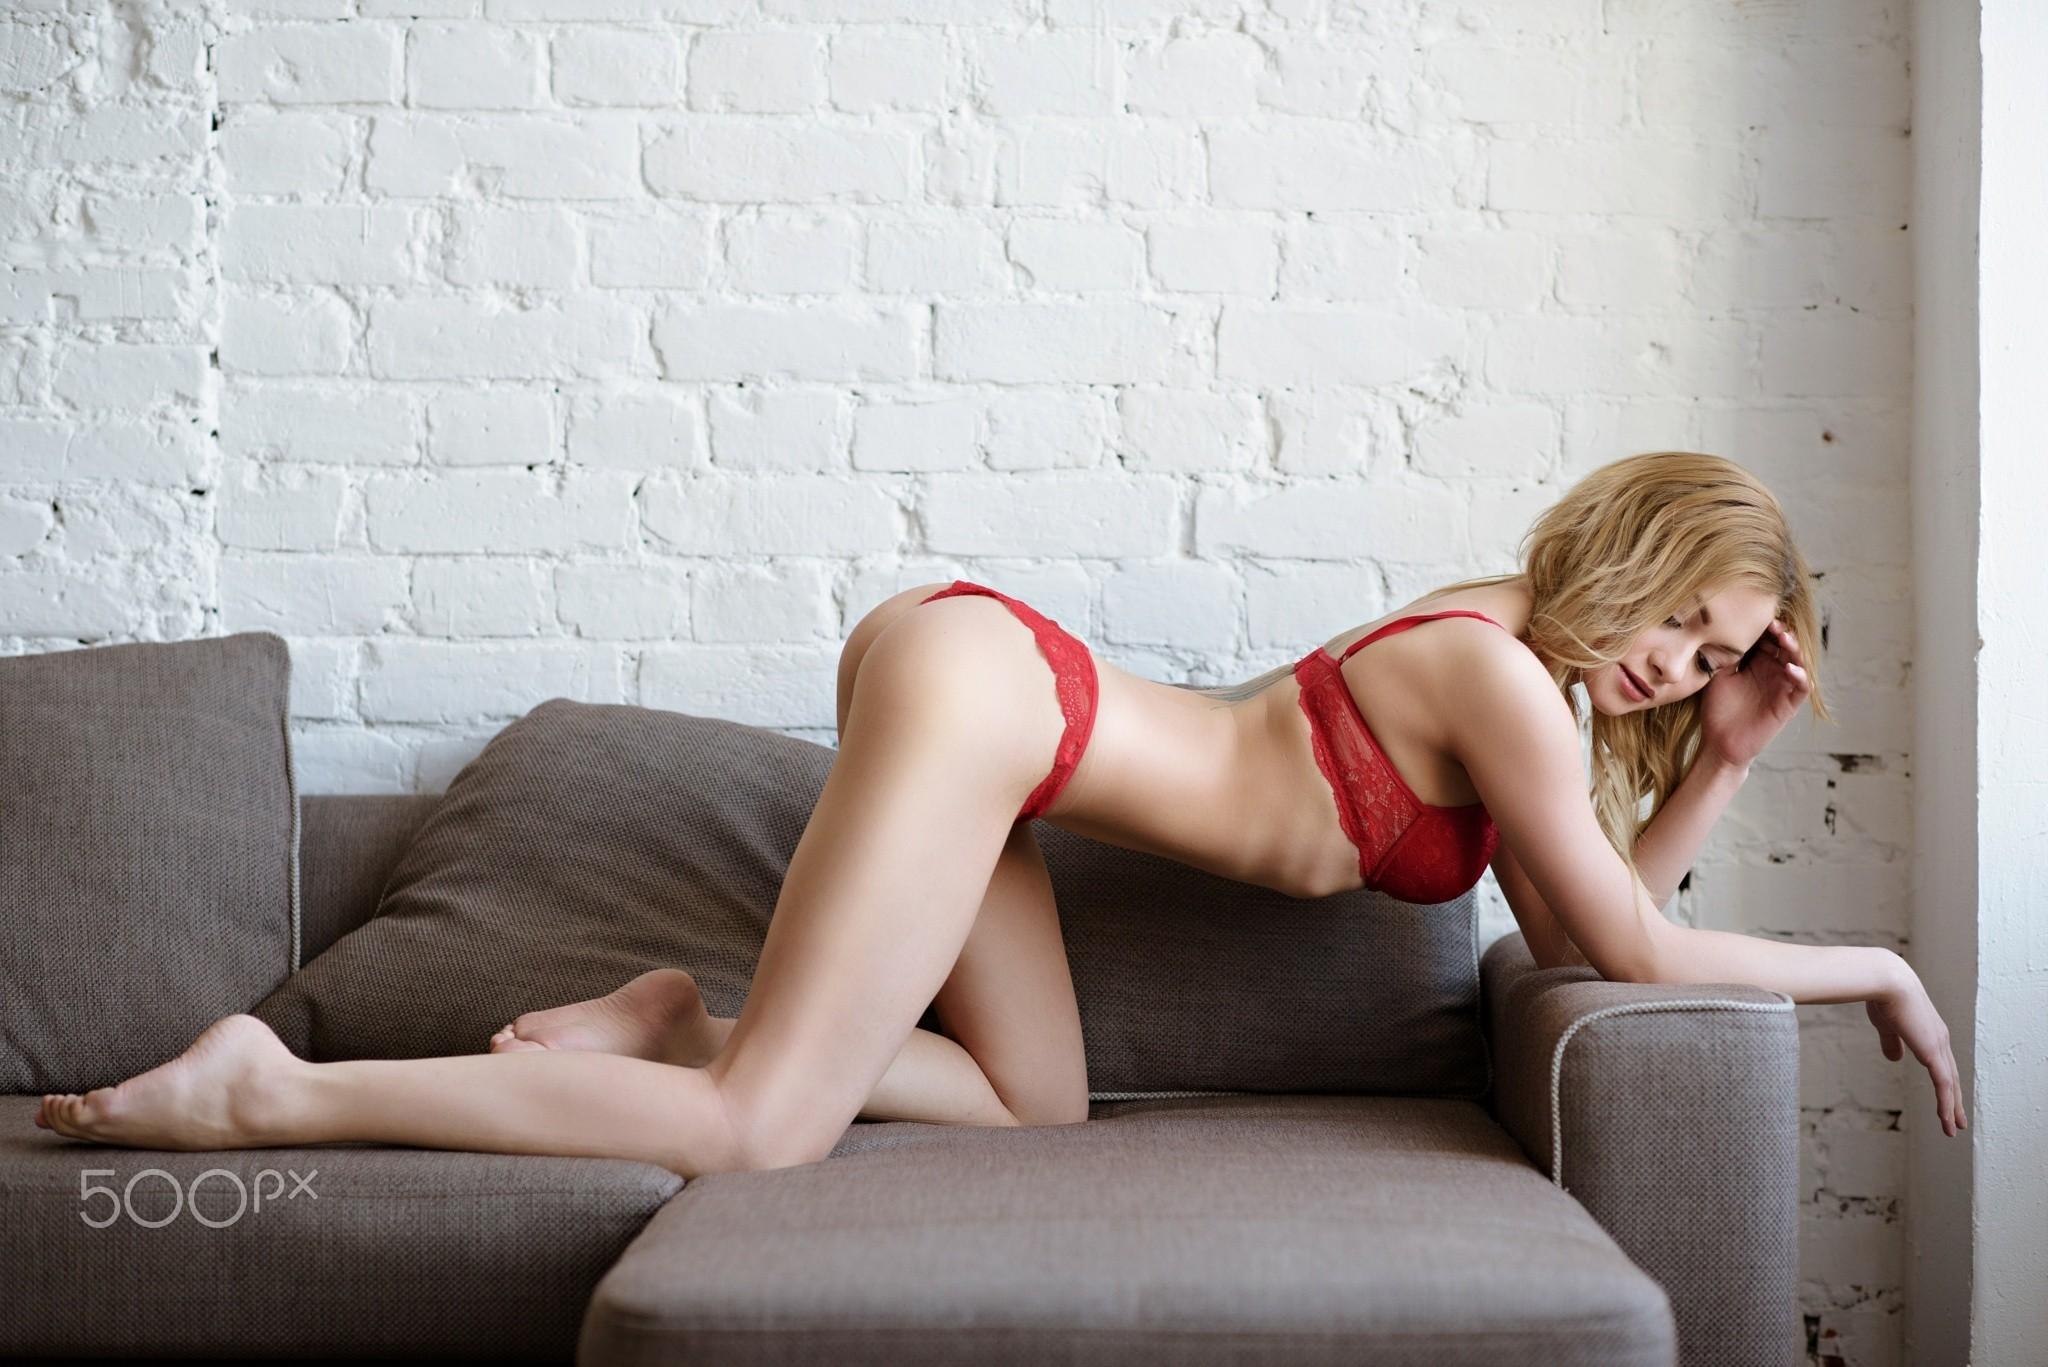 People 2048x1367 women ass blonde brunette red lingerie ribs wall bricks couch bent over 500px Galina Tcivina feet barefoot